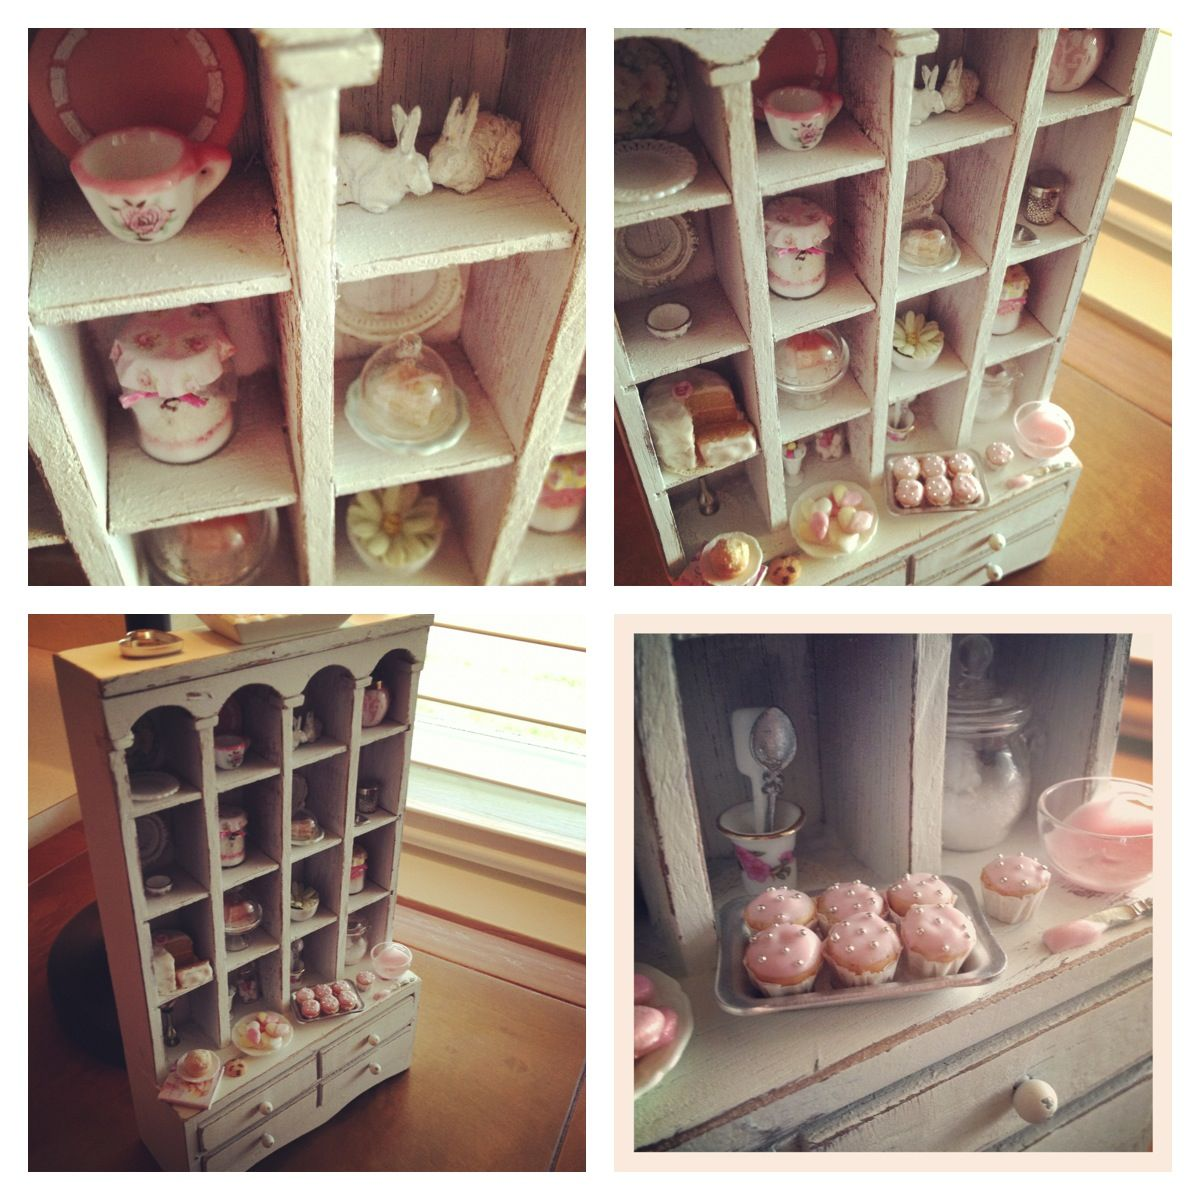 Shabby chic baking shelf 1:12 Dollhouse miniatures <3